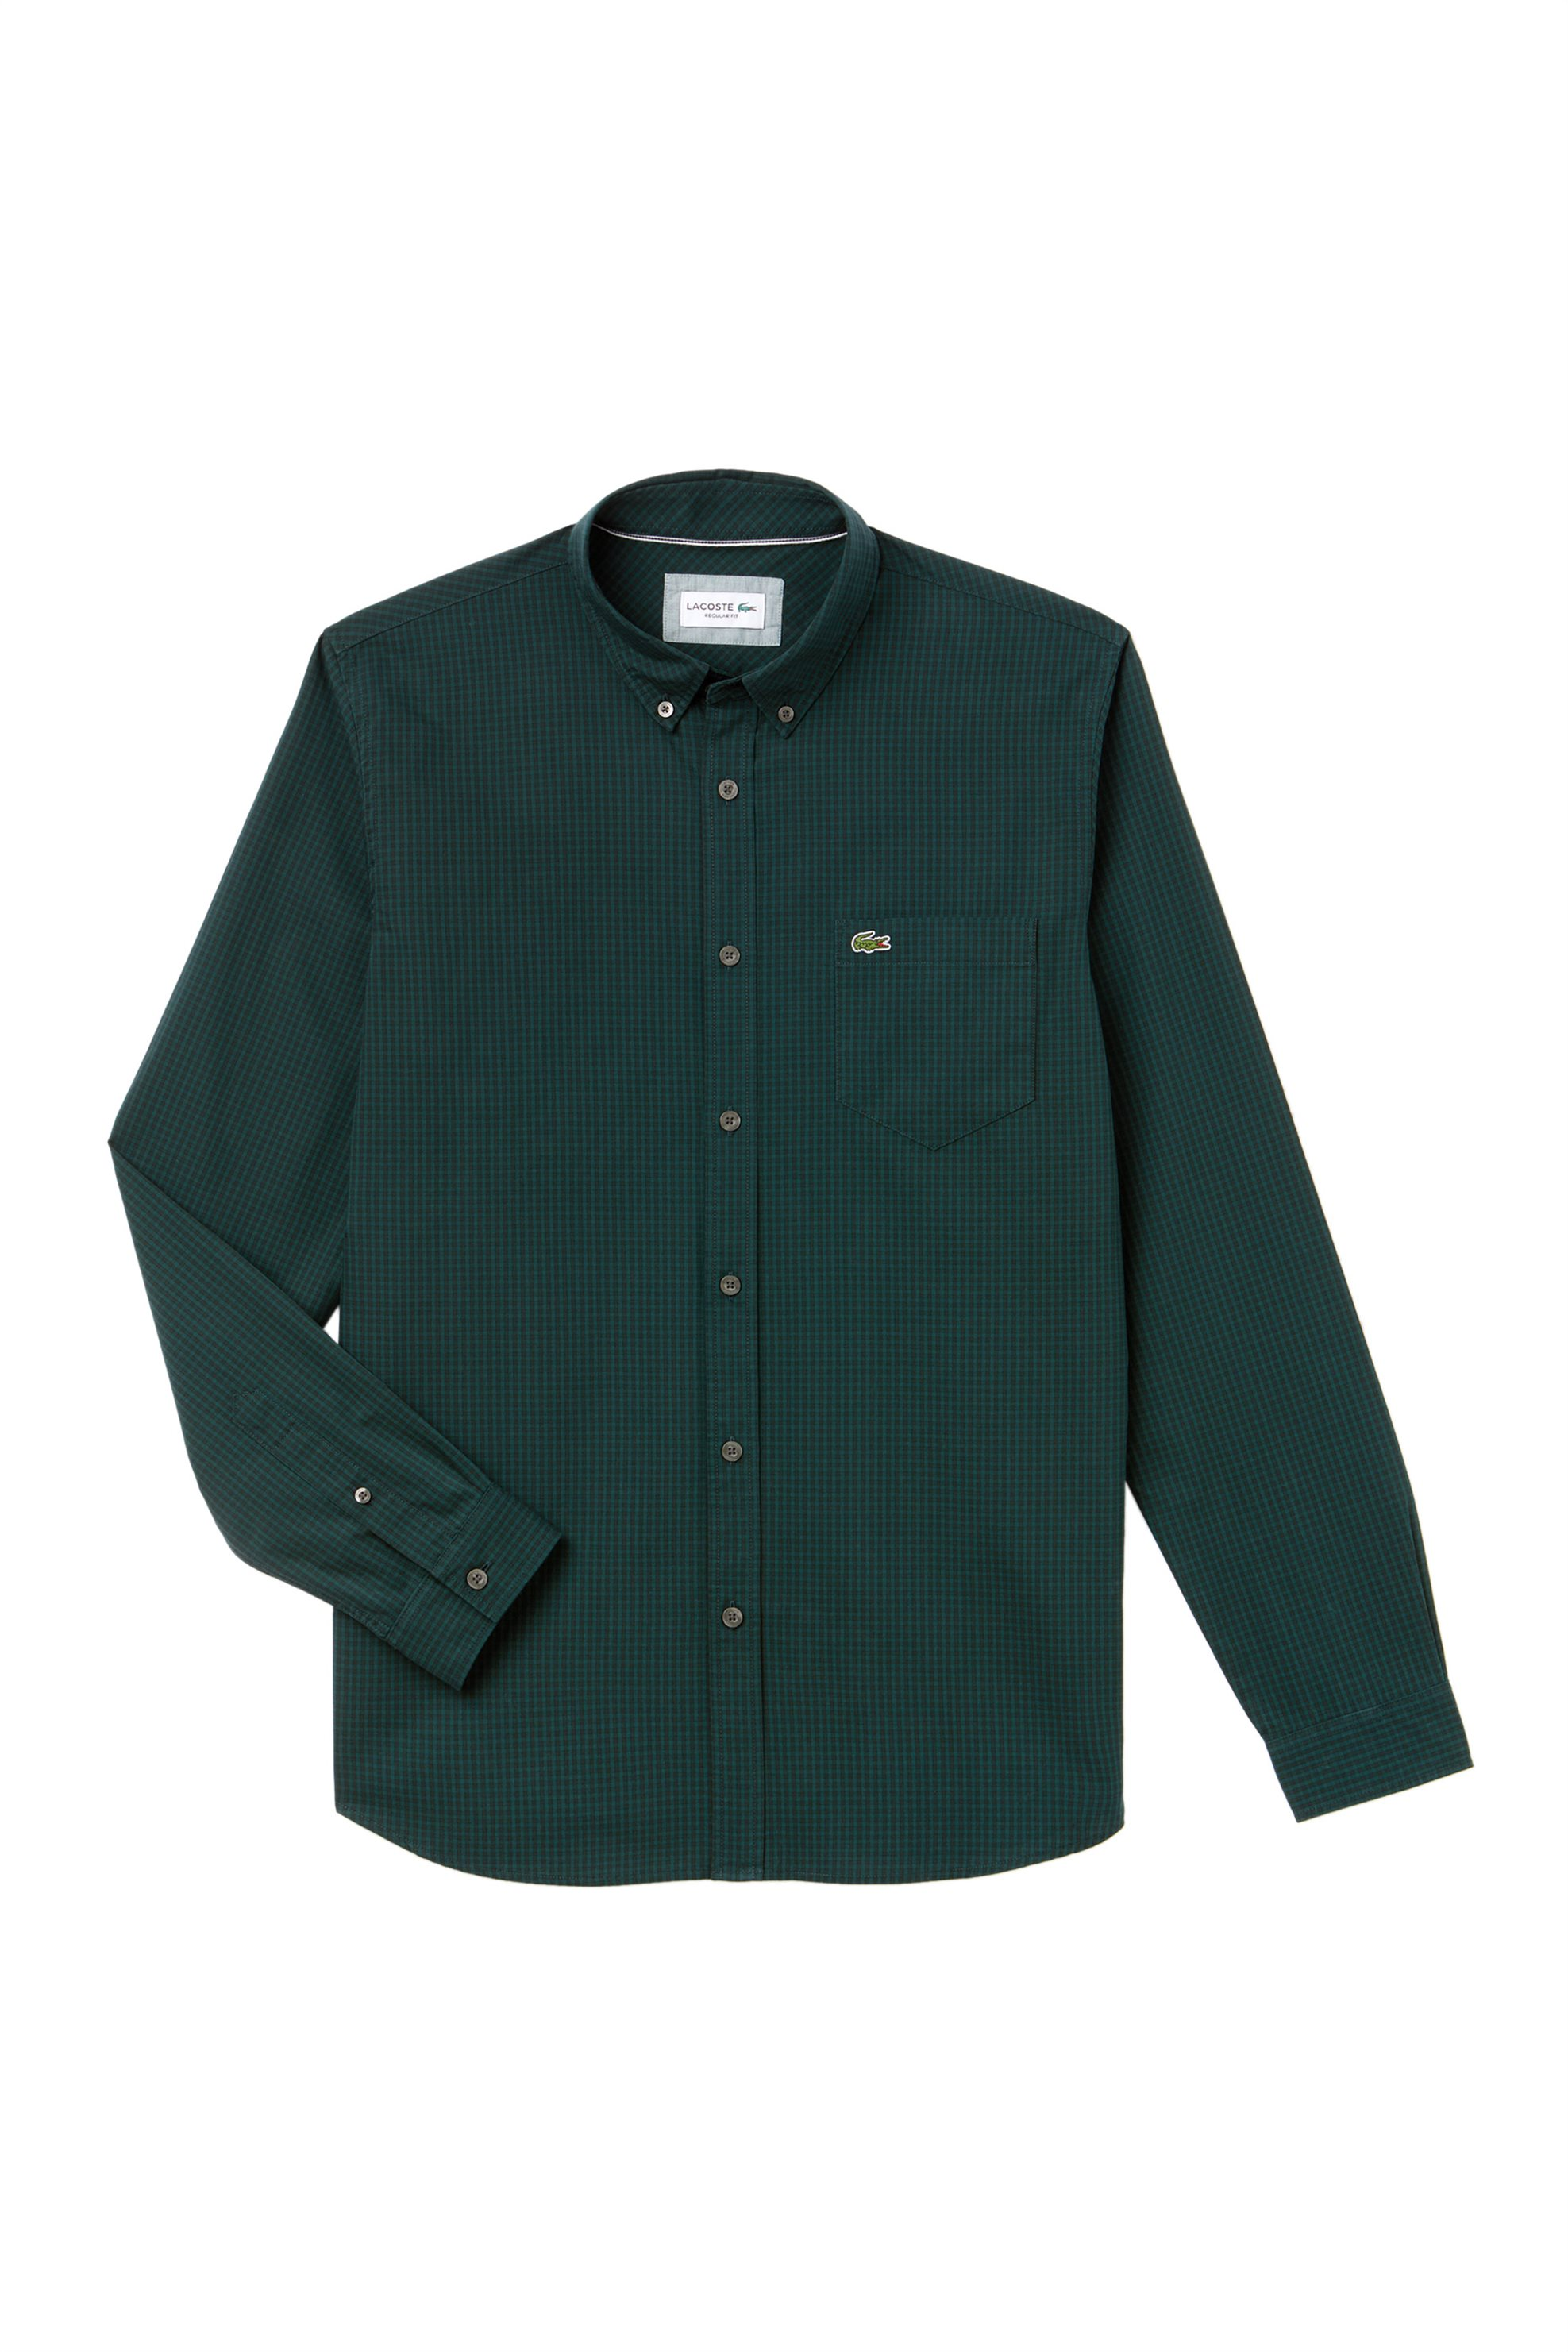 433aed688c60 Lacoste ανδρικό πουκάμισο με καρό σχέδιο - CH0483 - Κυπαρισσί